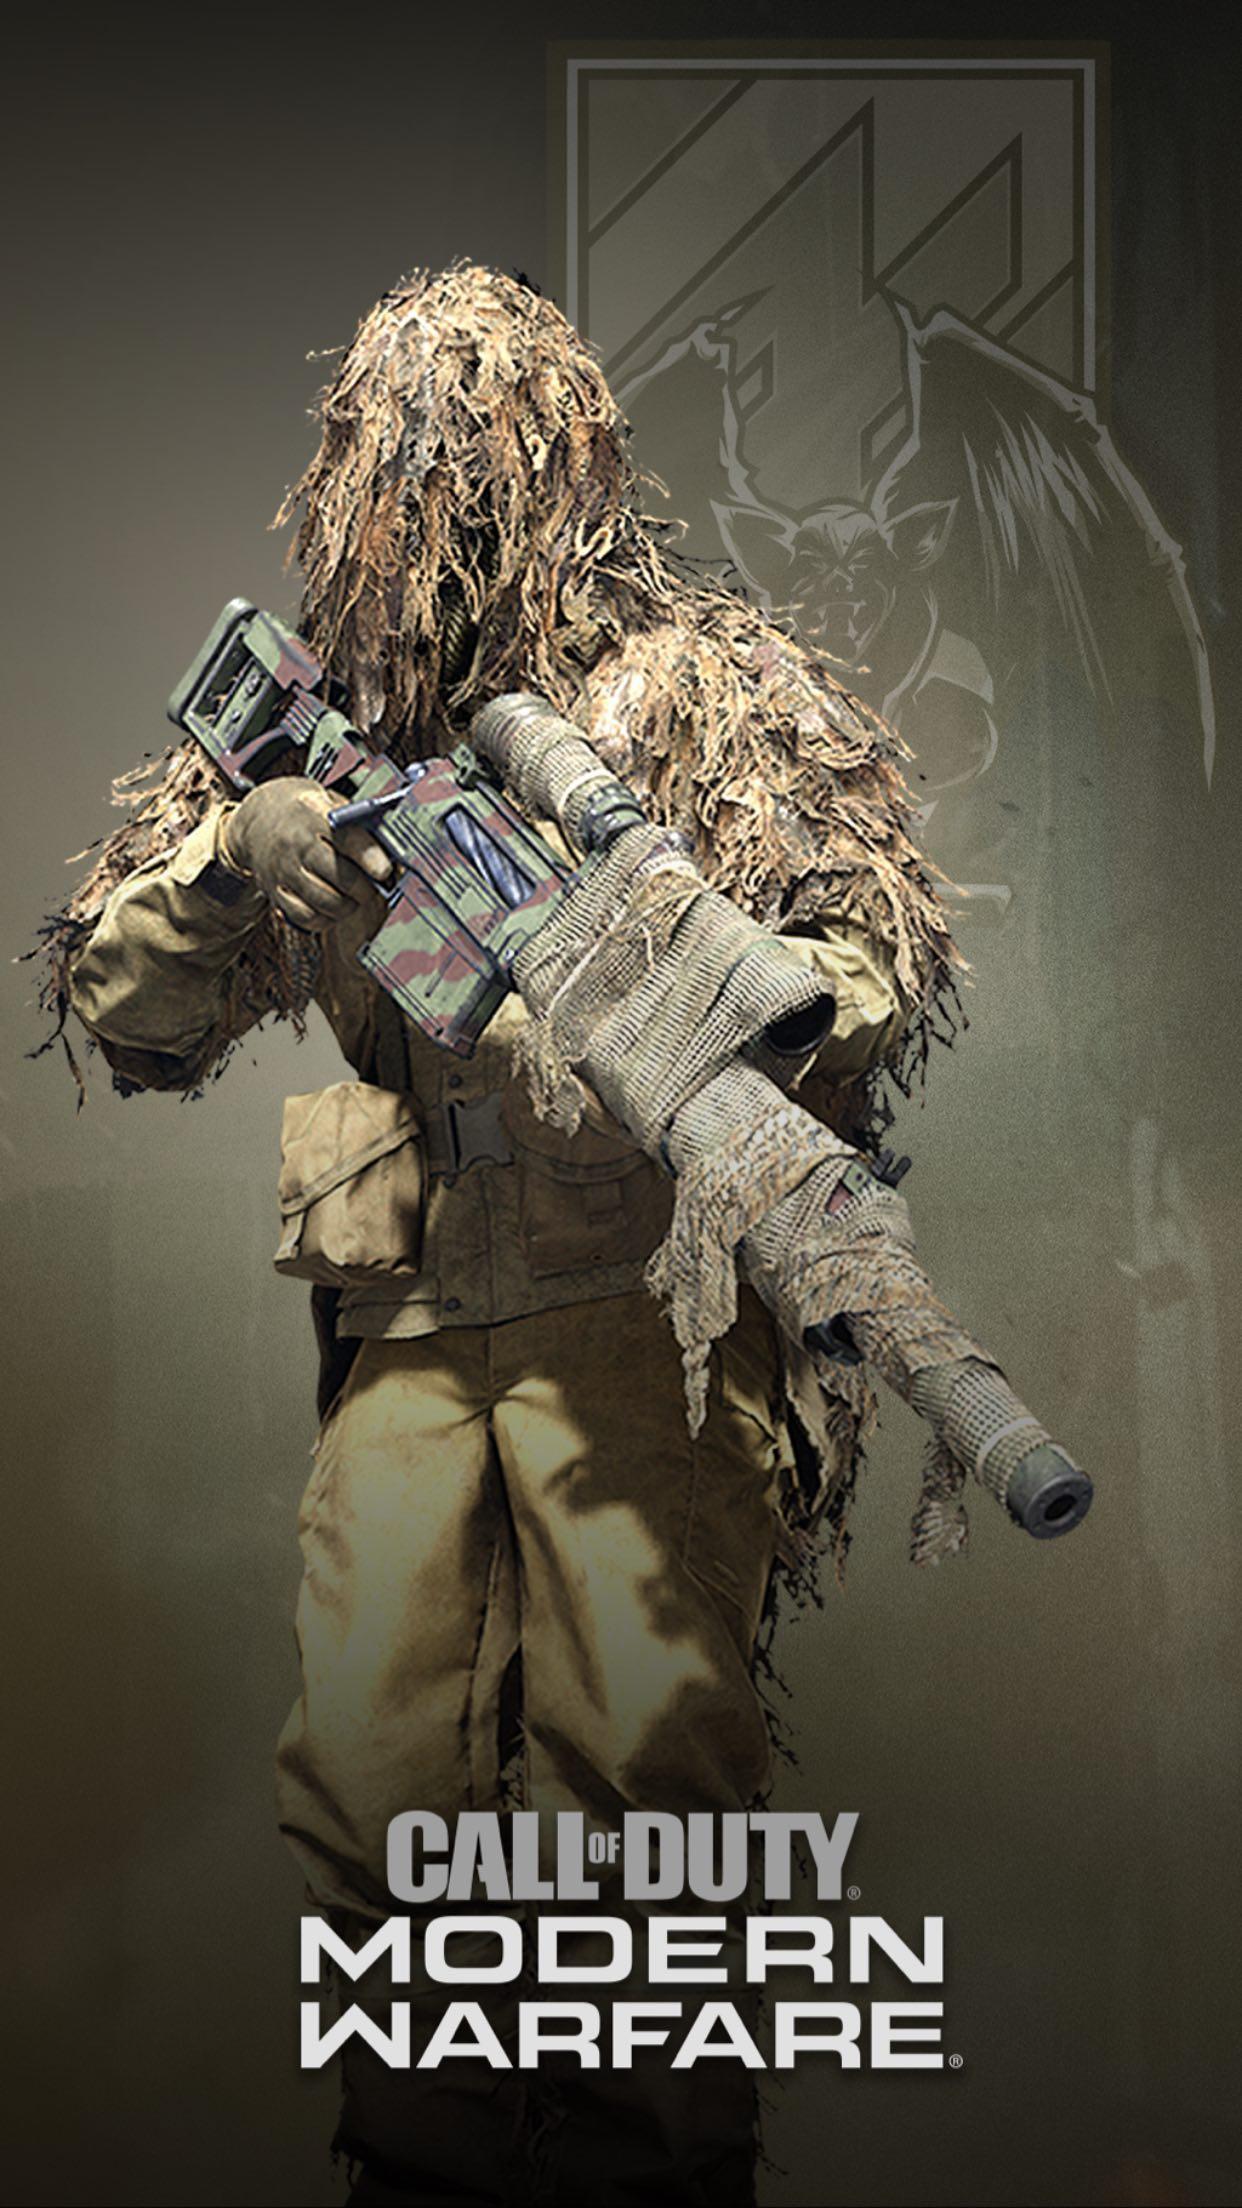 Call of duty Modern Warfare Mobile Phone Wallpaper set 5 of 17 1242x2208